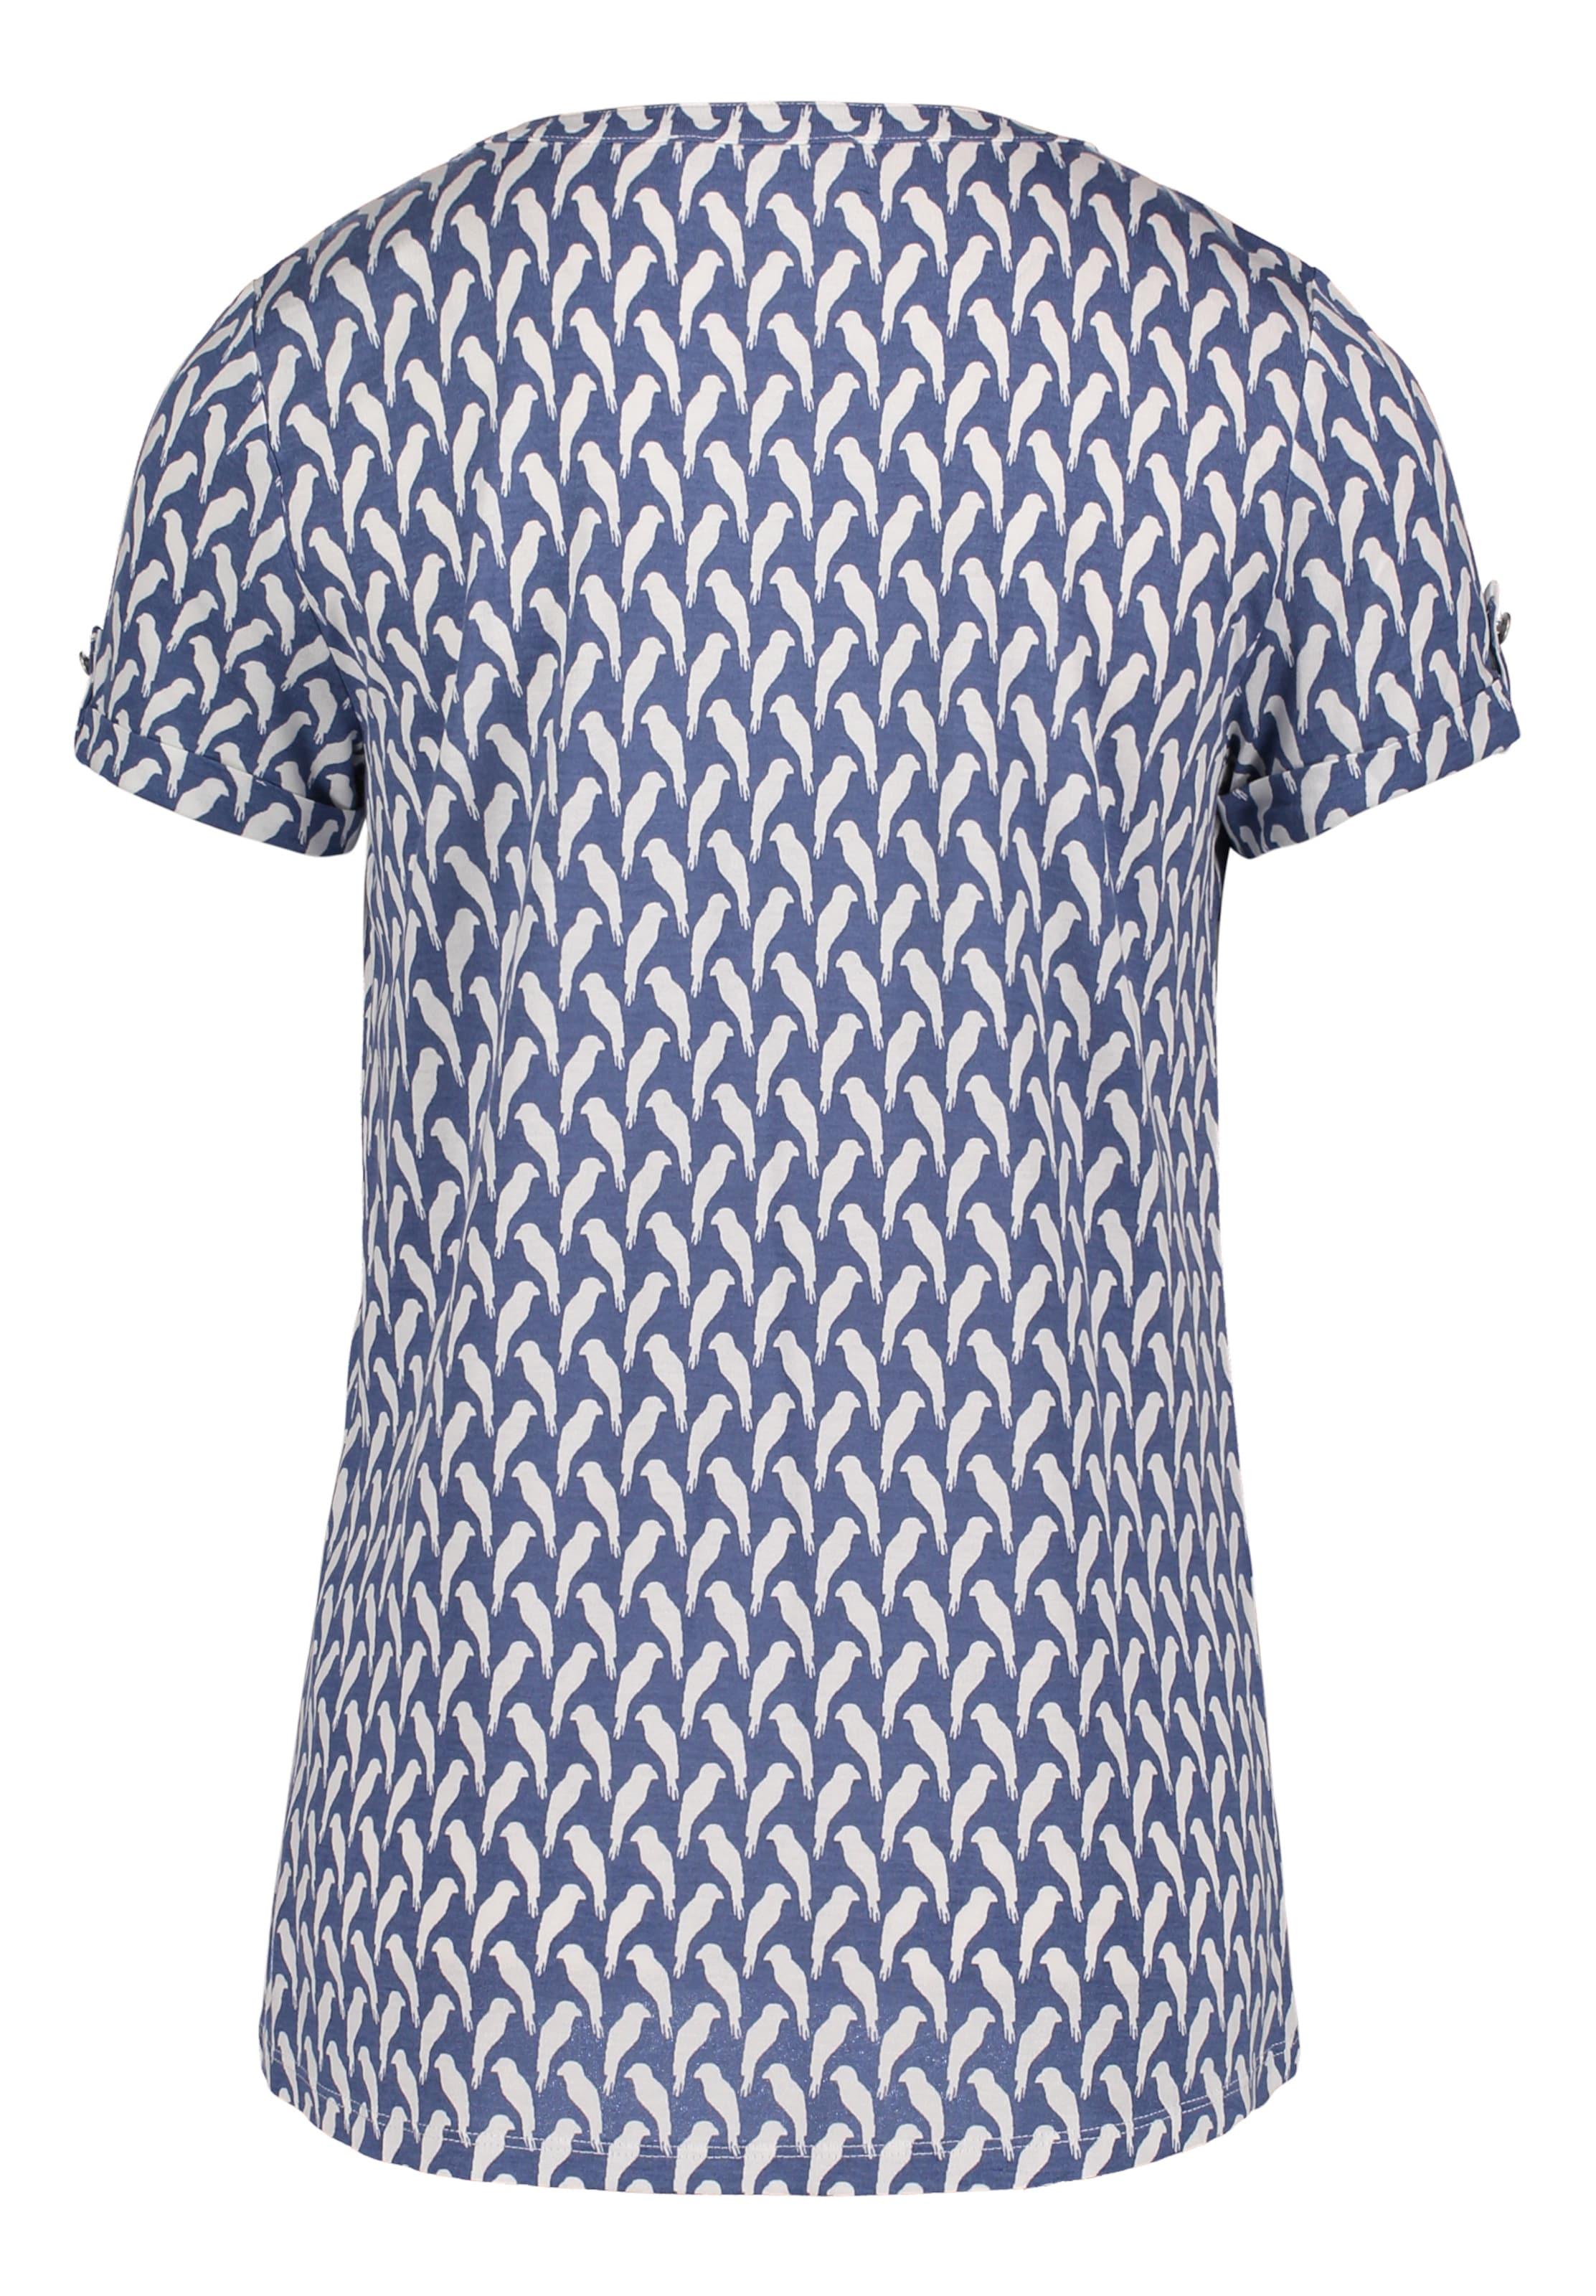 Betty Barclay Shirt Shirt HimmelblauWeiß HimmelblauWeiß Betty In Barclay Barclay Betty Shirt In In kP8wOn0X